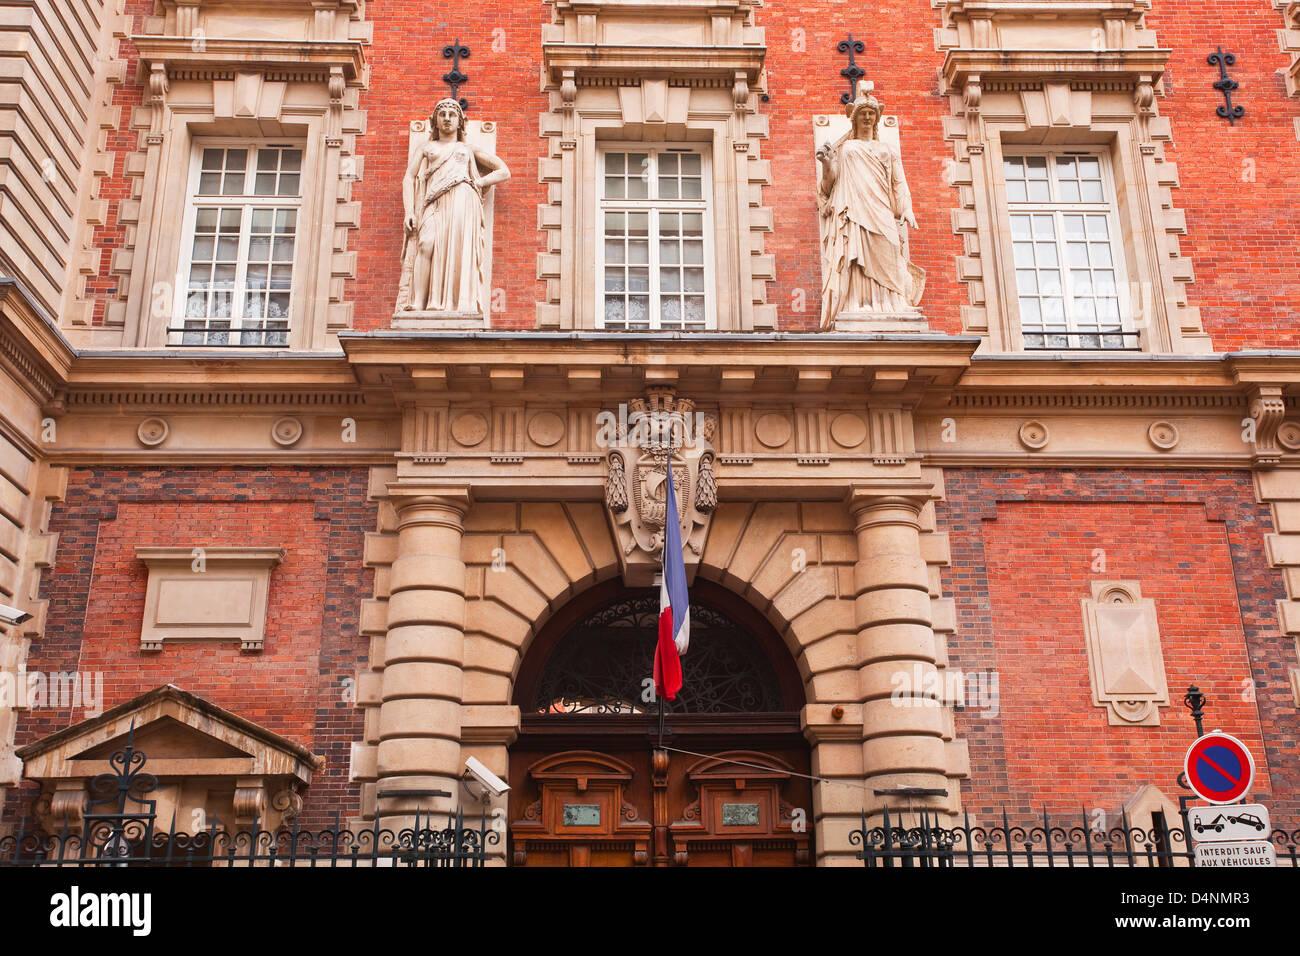 The Gendarmerie Nationale building in rue de la Banque, Paris. - Stock Image